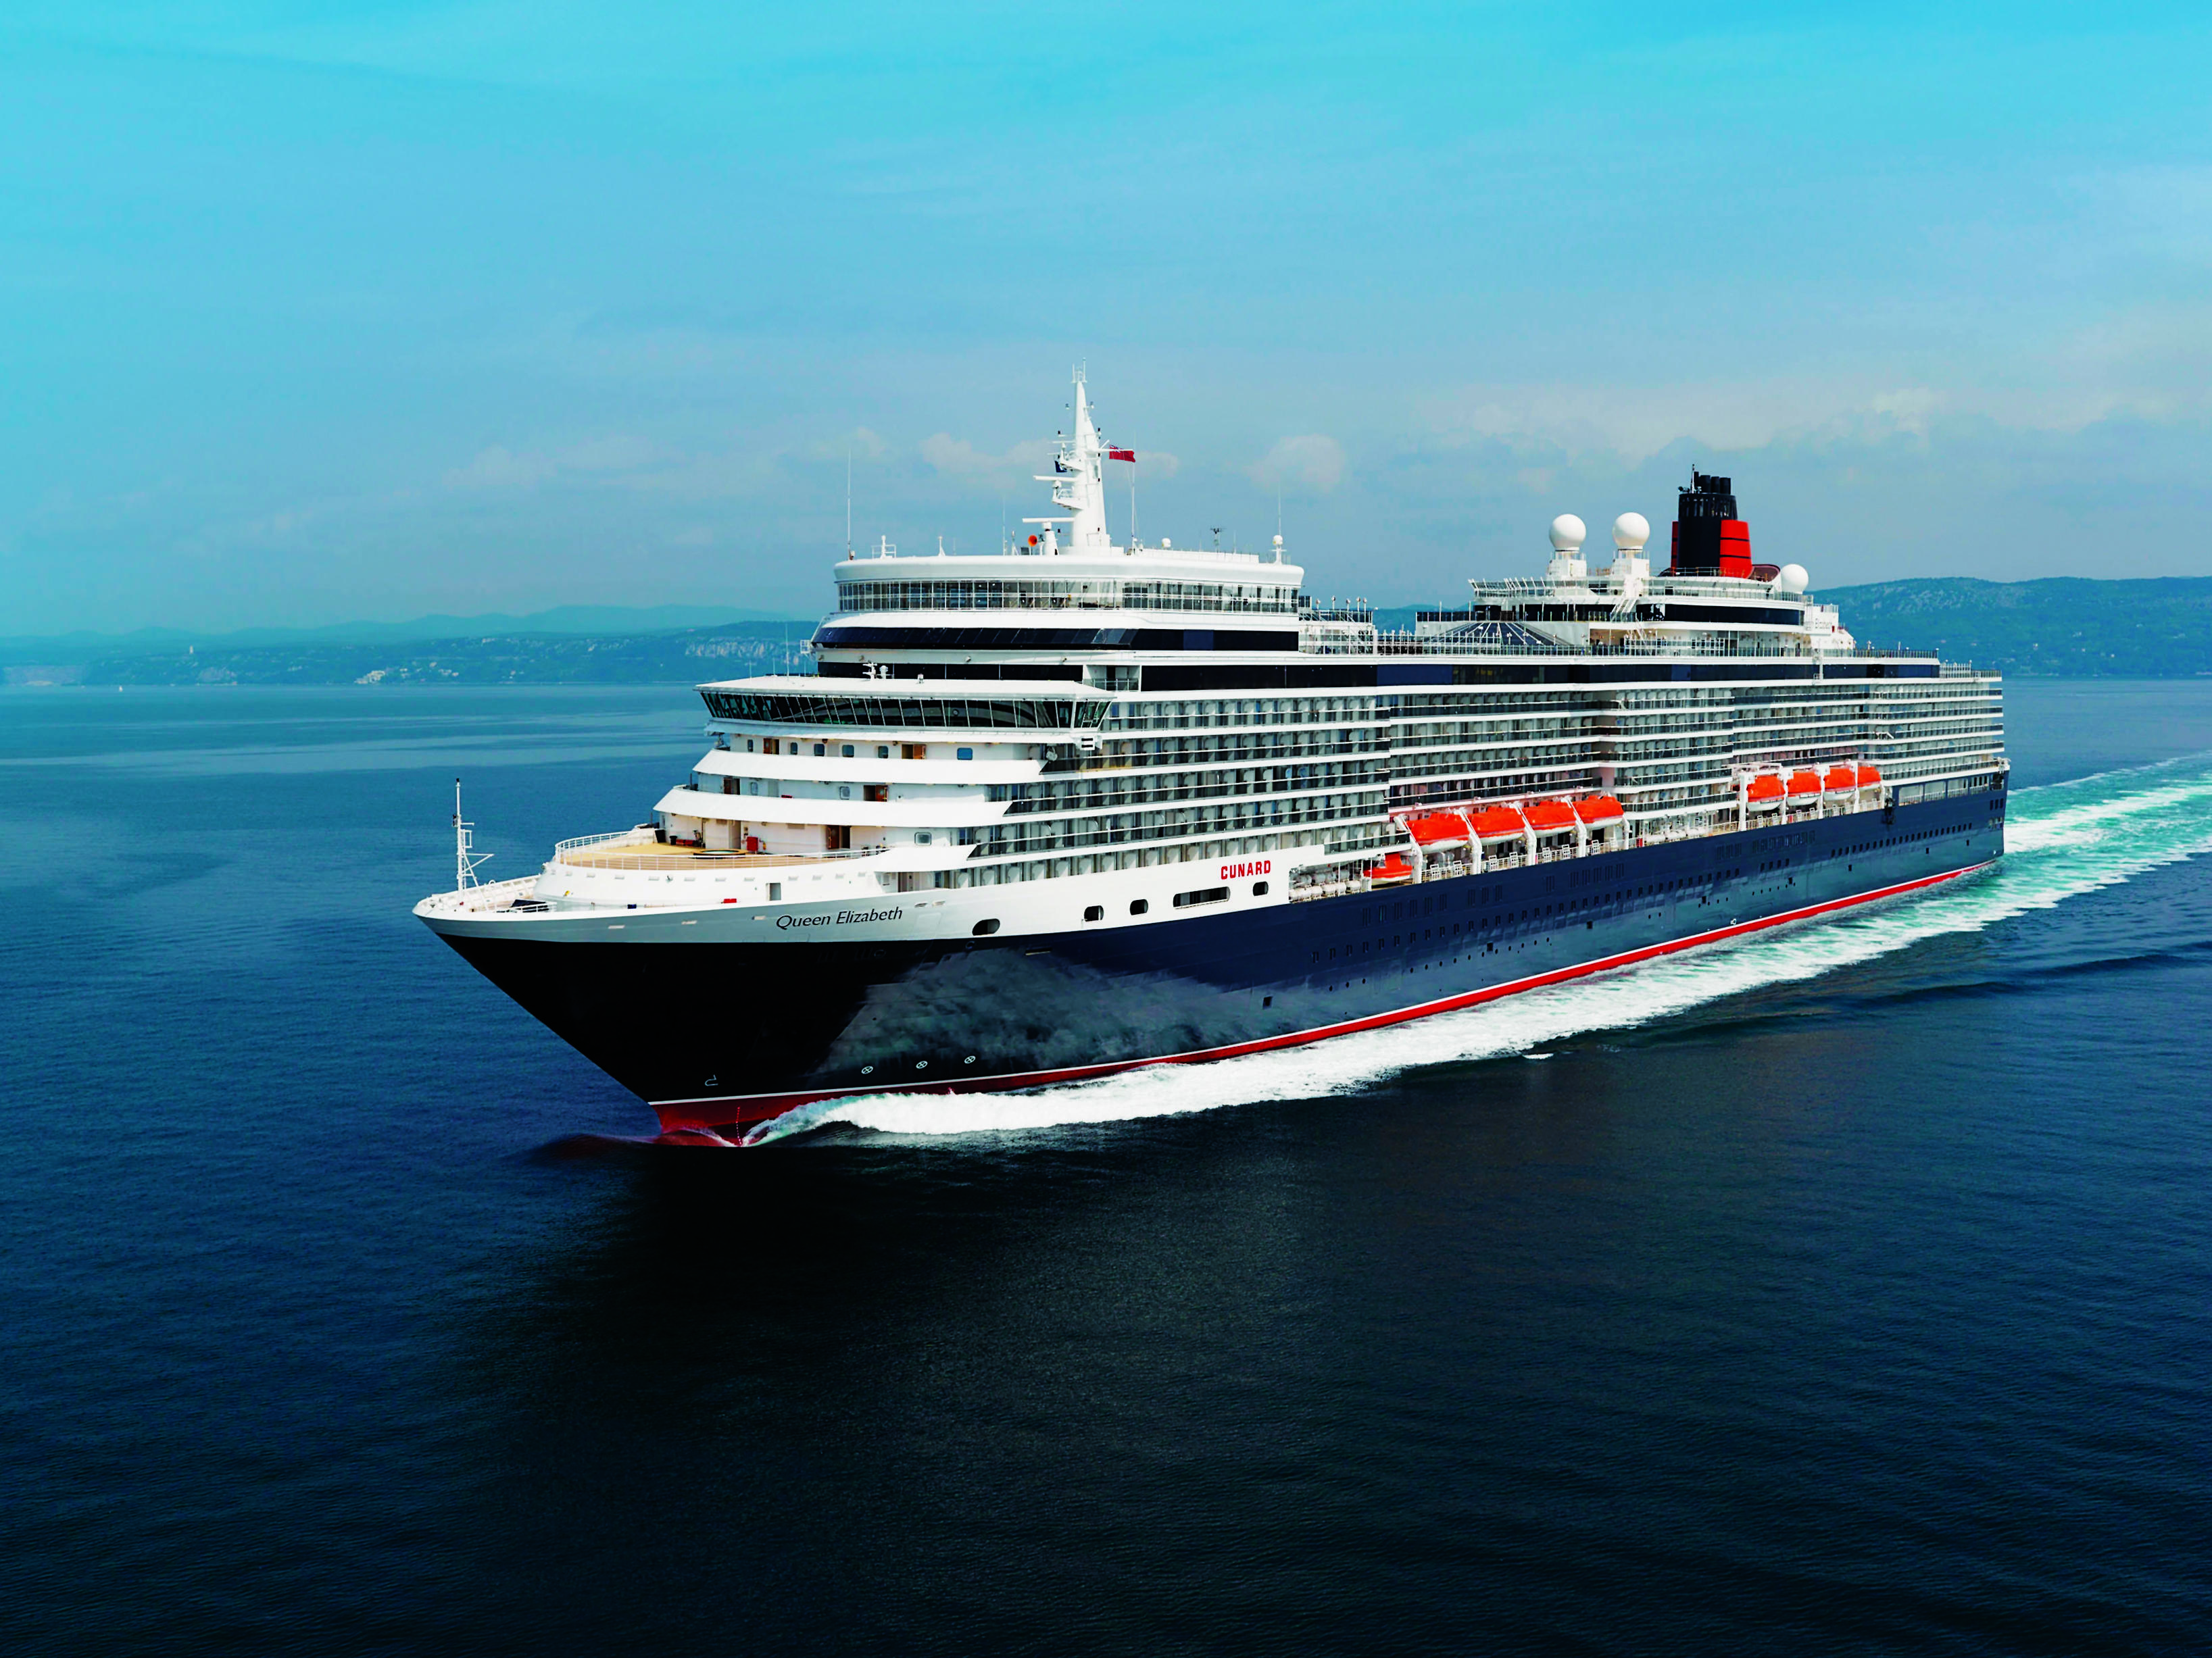 Cunard Queen Elizabeth Cruise Ship Reviews 2018 UPDATED